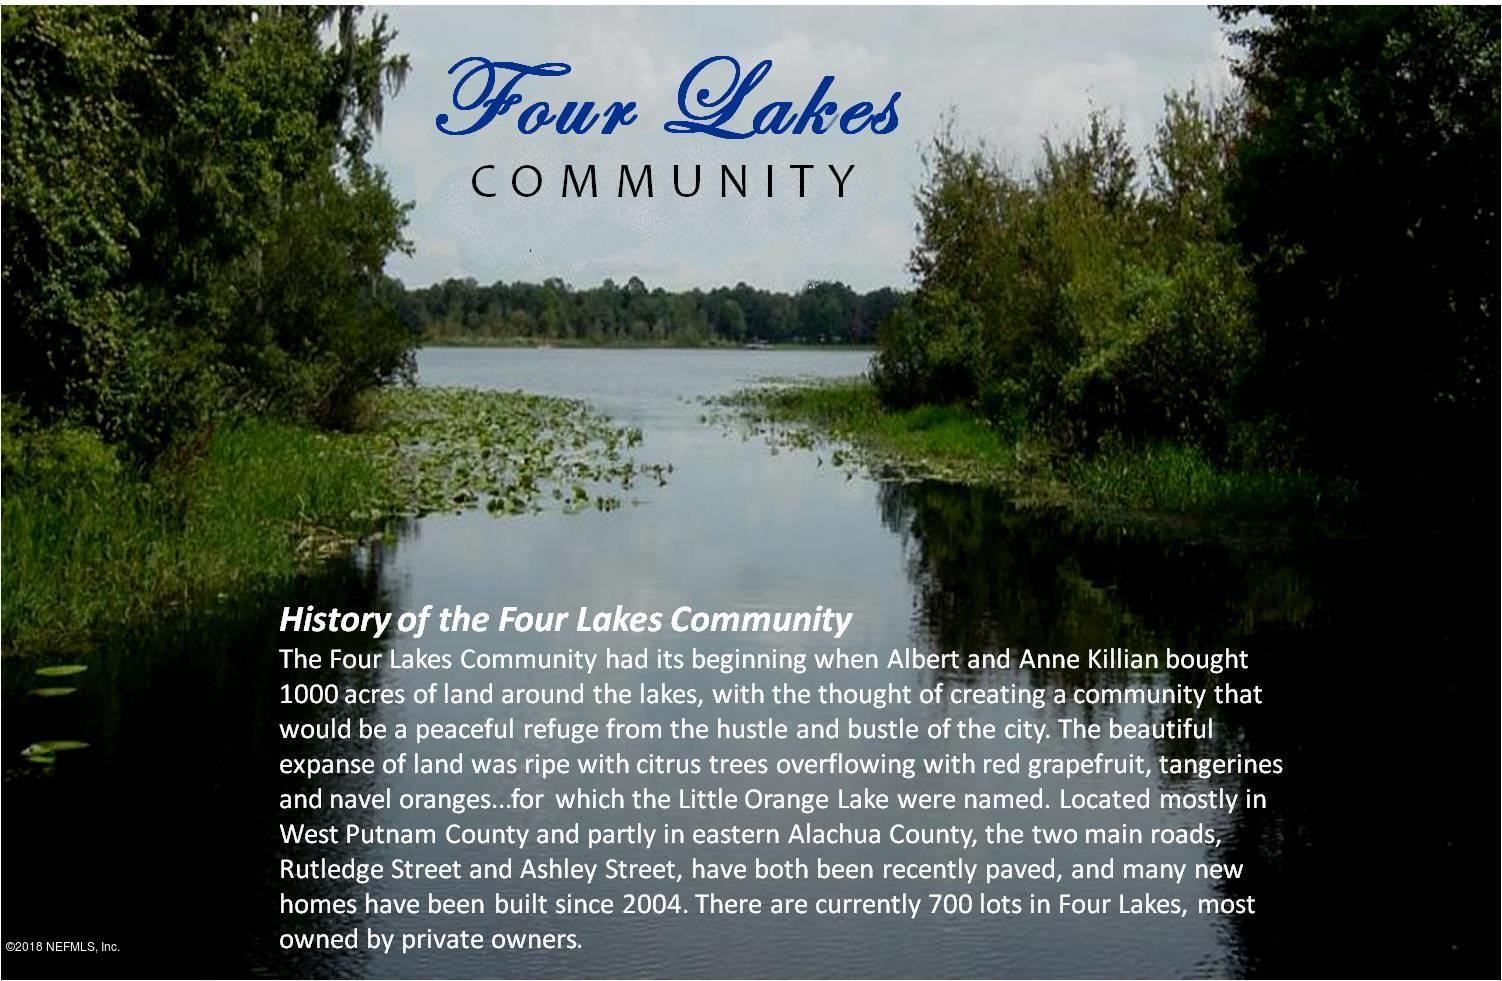 235 LITTLE ORANGE LAKE, HAWTHORNE, FLORIDA 32640, ,Vacant land,For sale,LITTLE ORANGE LAKE,935995